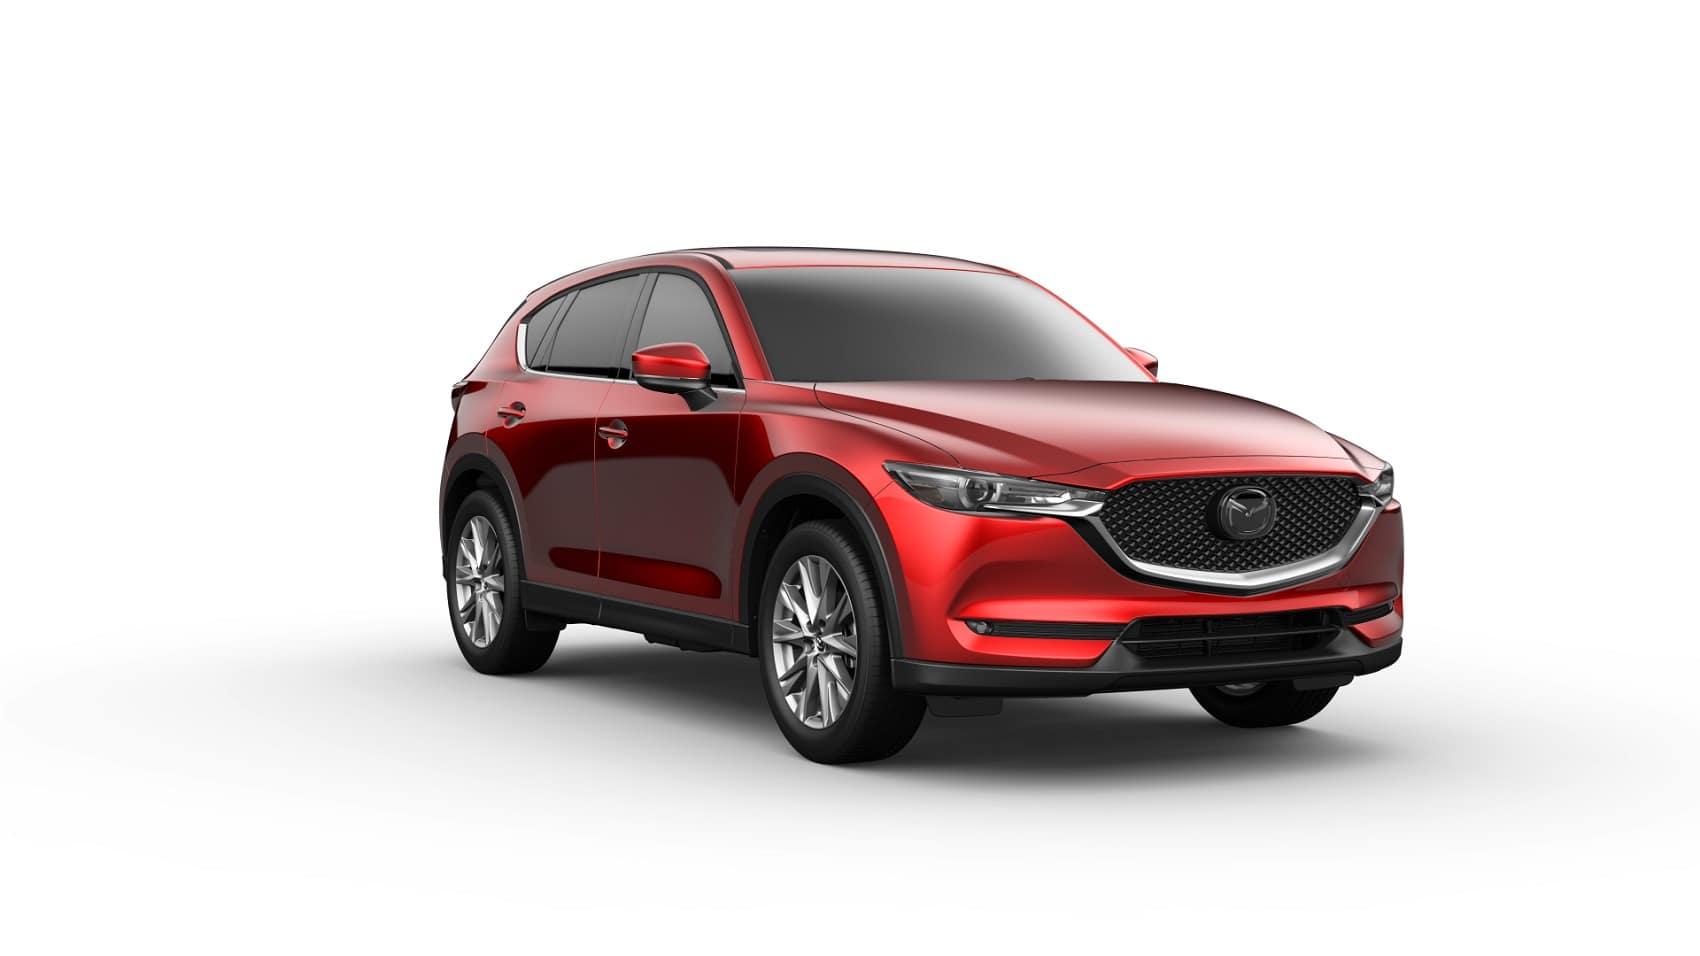 2019 Mazda CX-5 Grand Touring - Soul Red Crystal Metallic